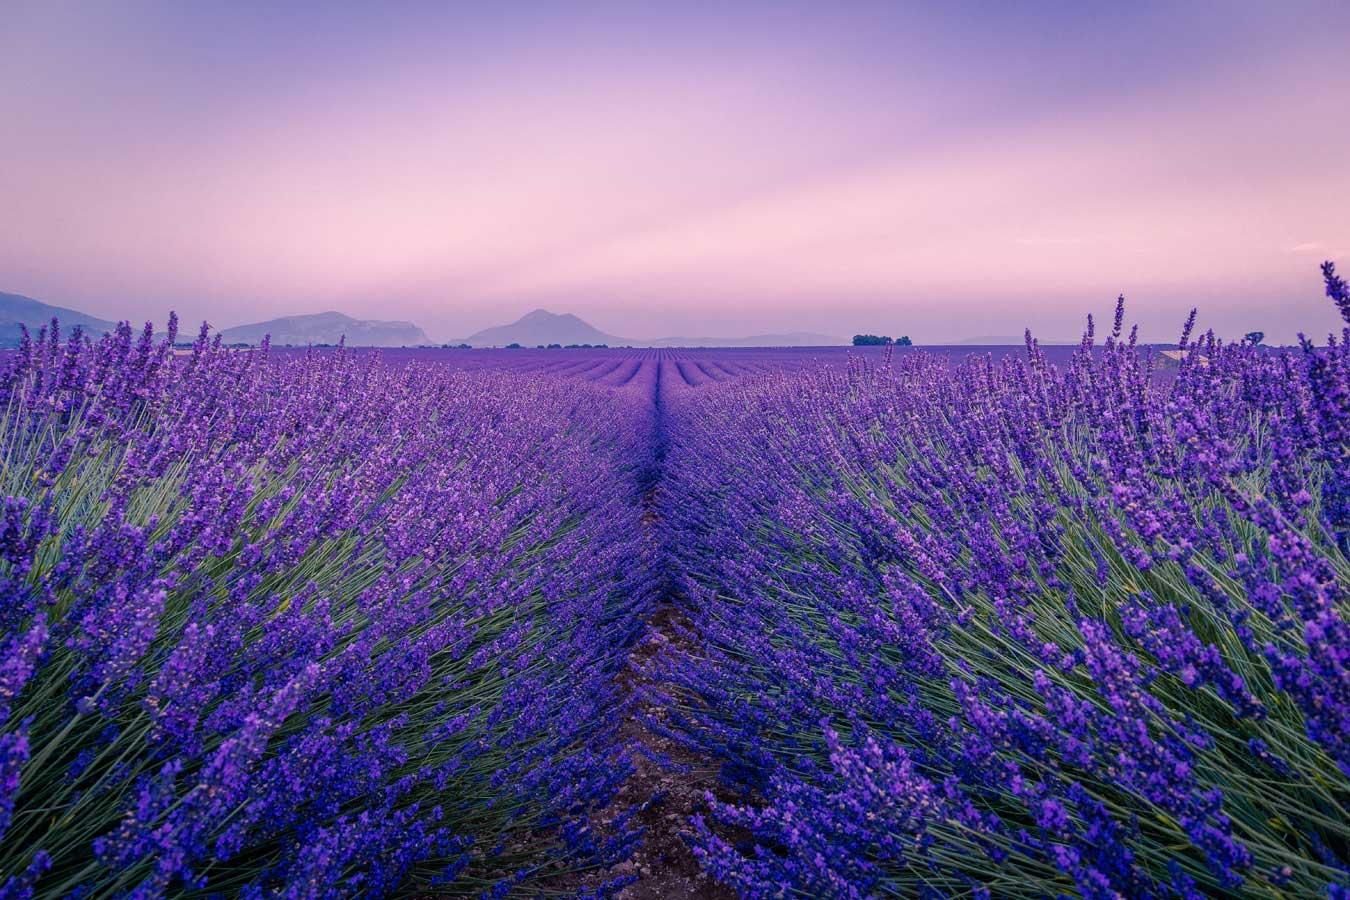 Provence, Lavendelfeld